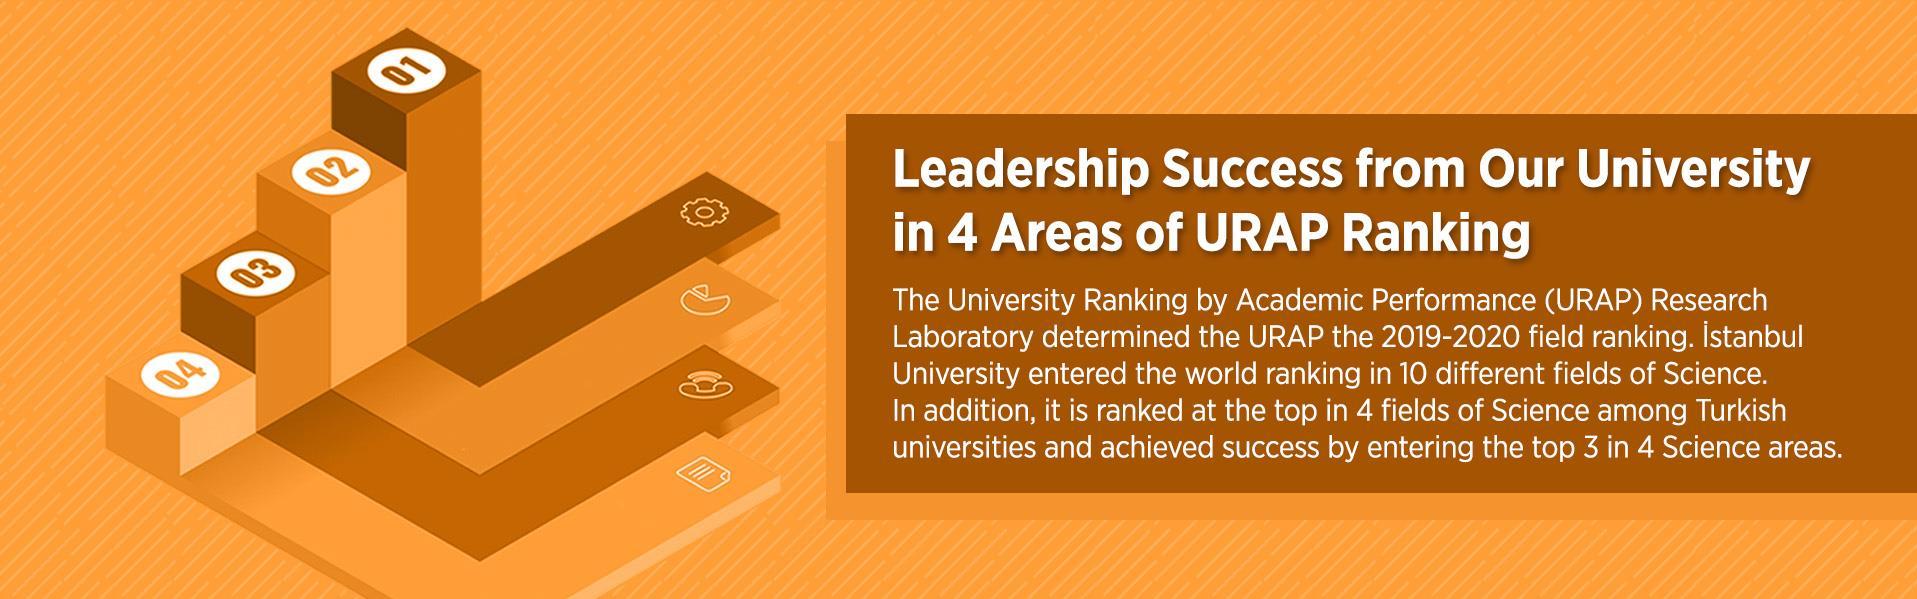 URAP ranking